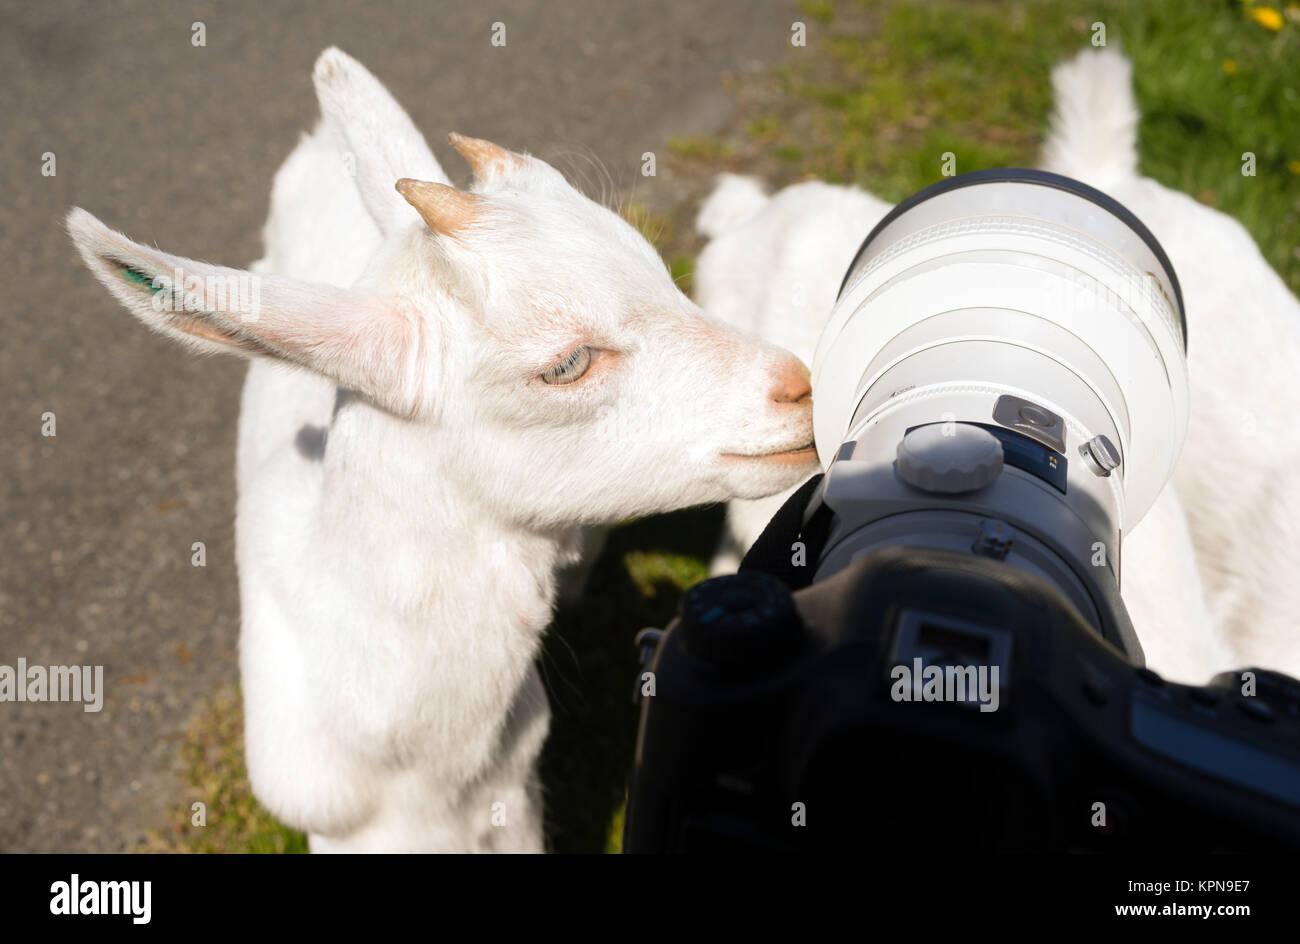 https://c8.alamy.com/comp/KPN9E7/newborn-animal-albino-goat-explores-camera-long-zoom-lens-KPN9E7.jpg